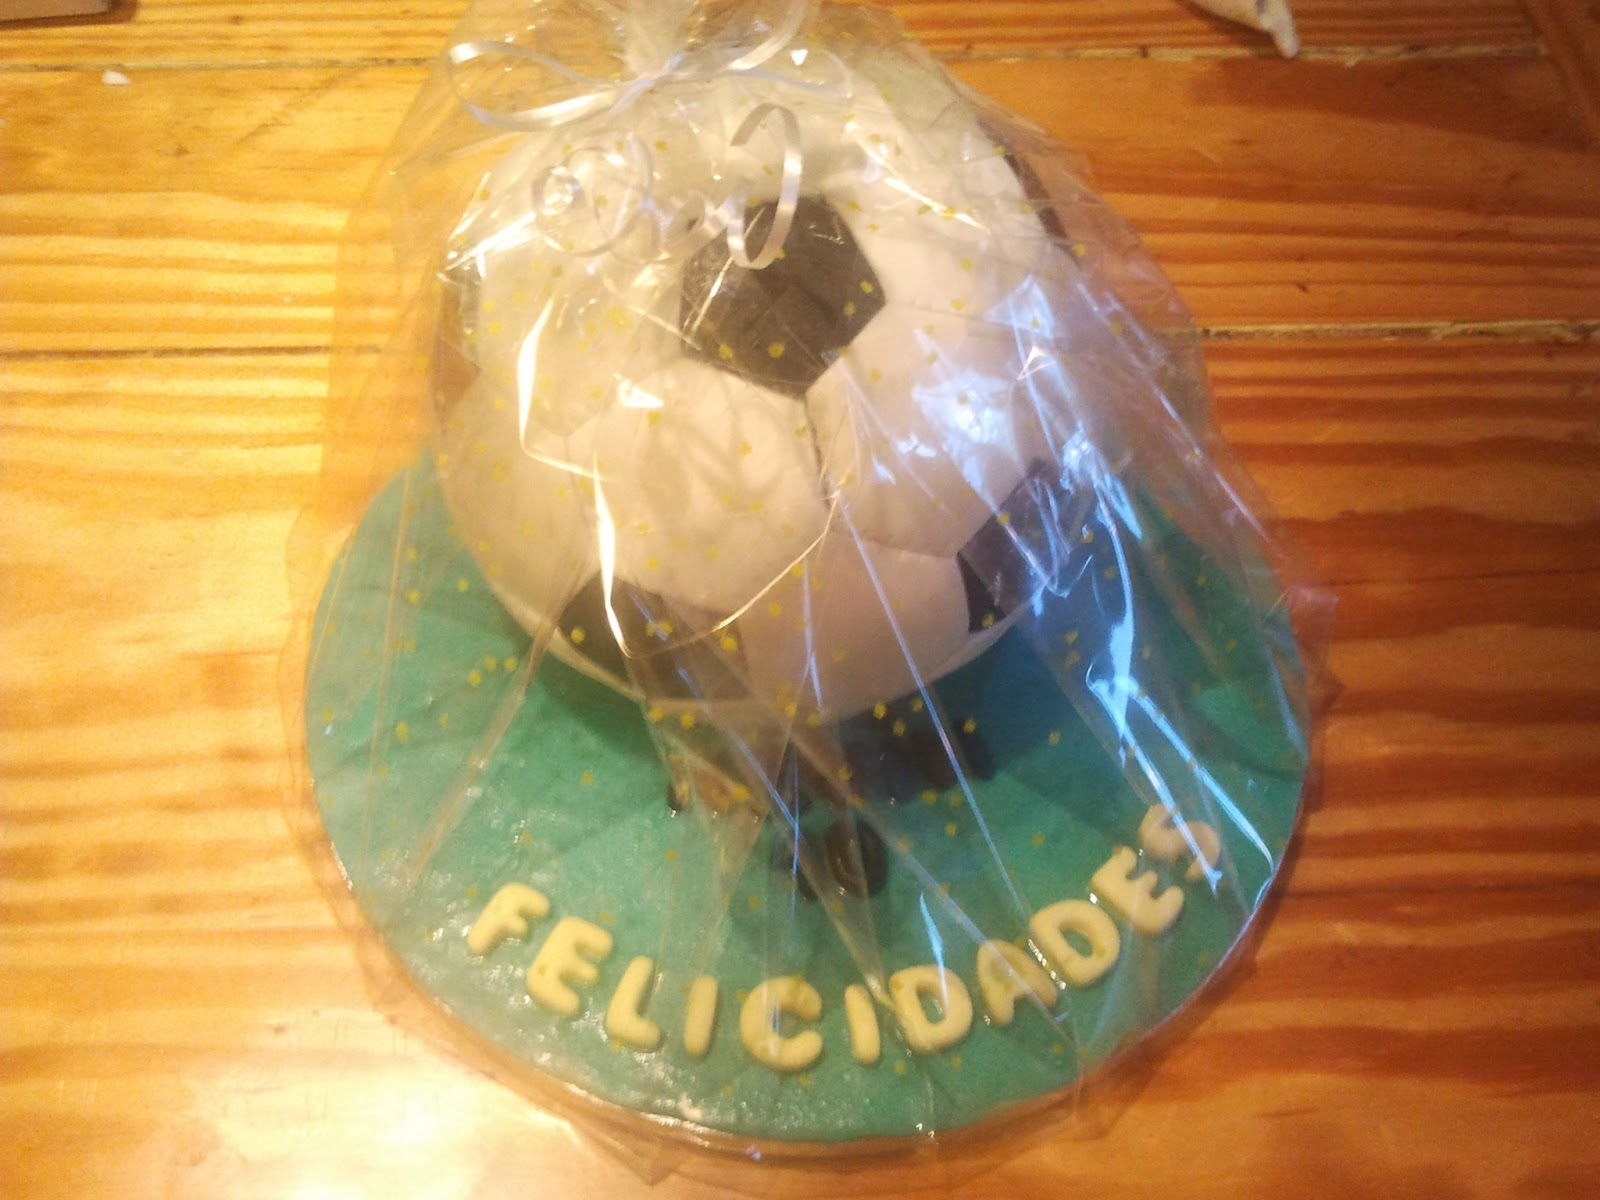 Tarta balon de futbol imaginarte tartas - Empaquetado de regalos ...